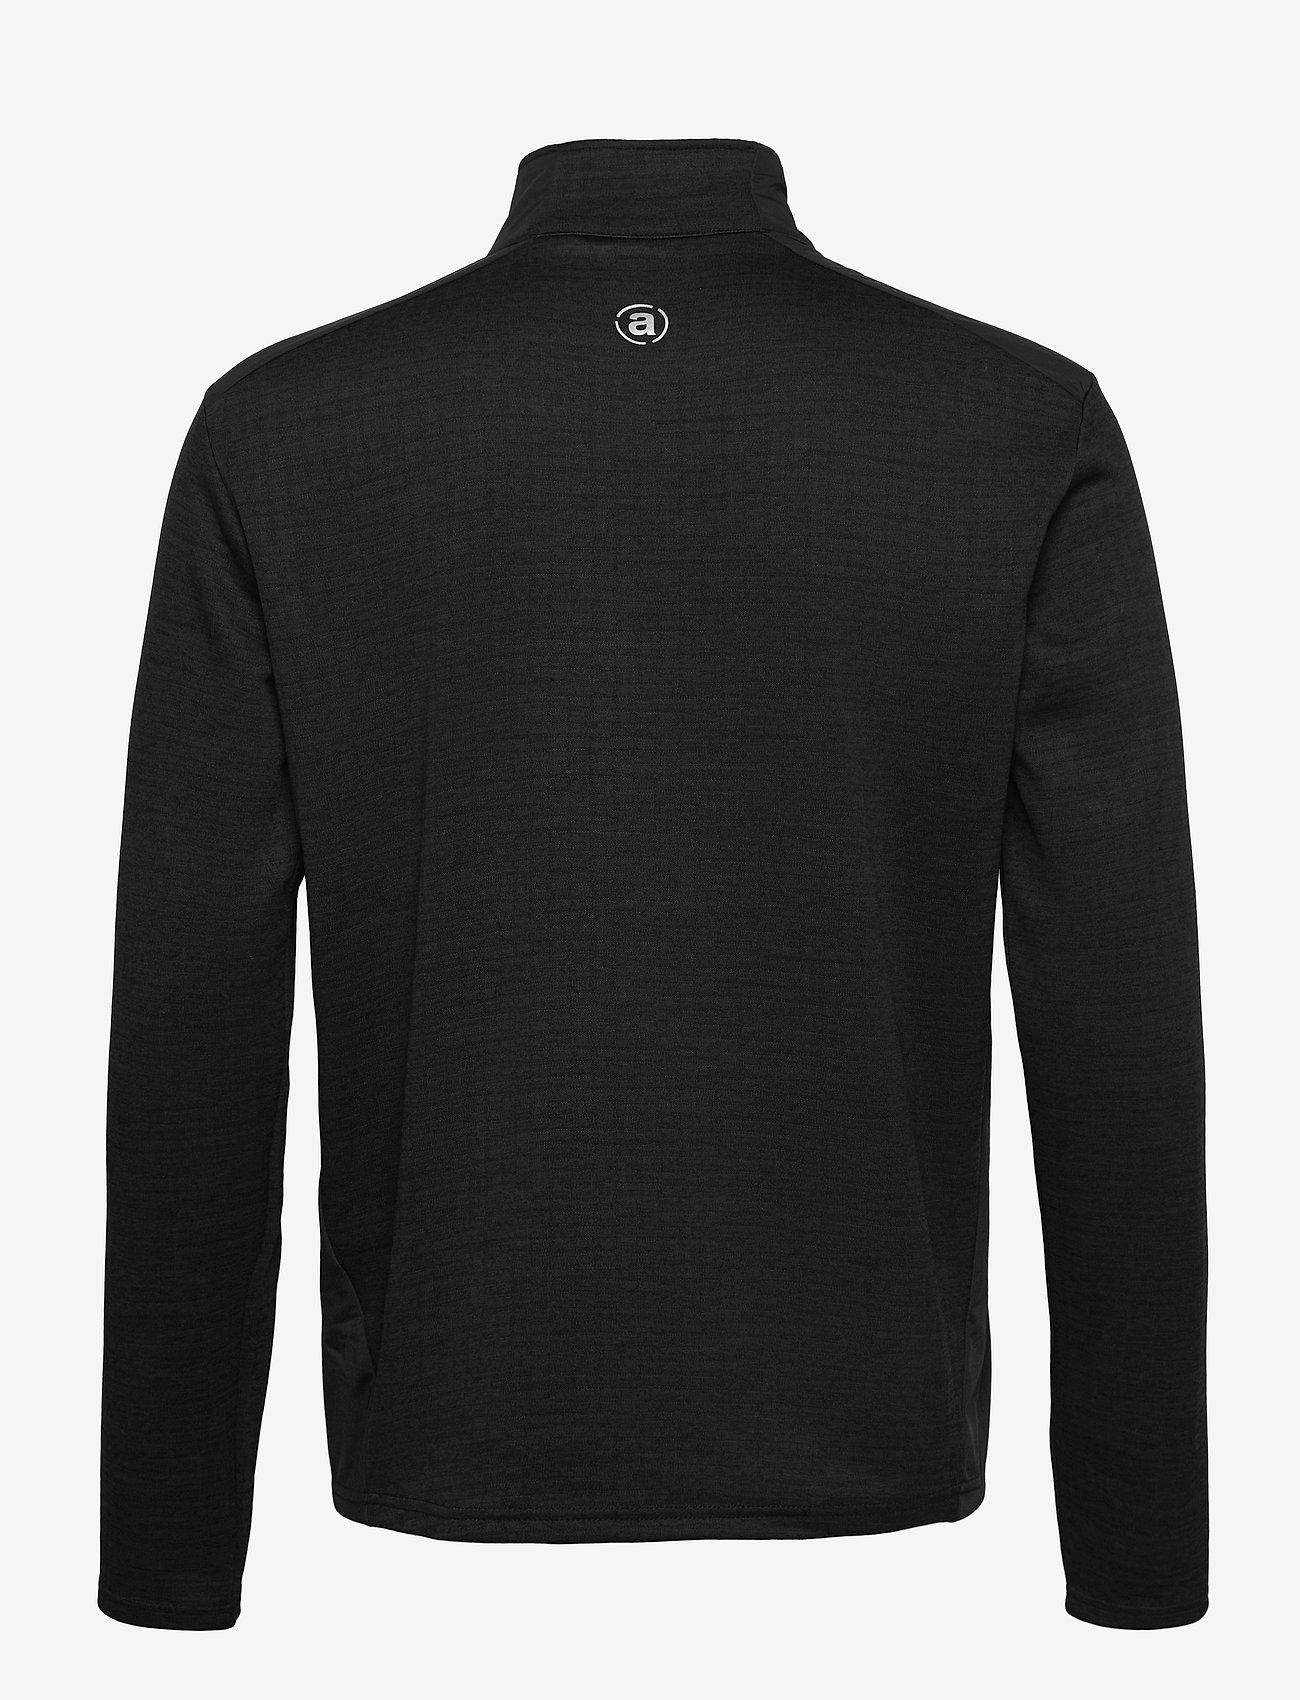 Abacus - Mens Sunningdale halfzip - golf jackets - black - 1